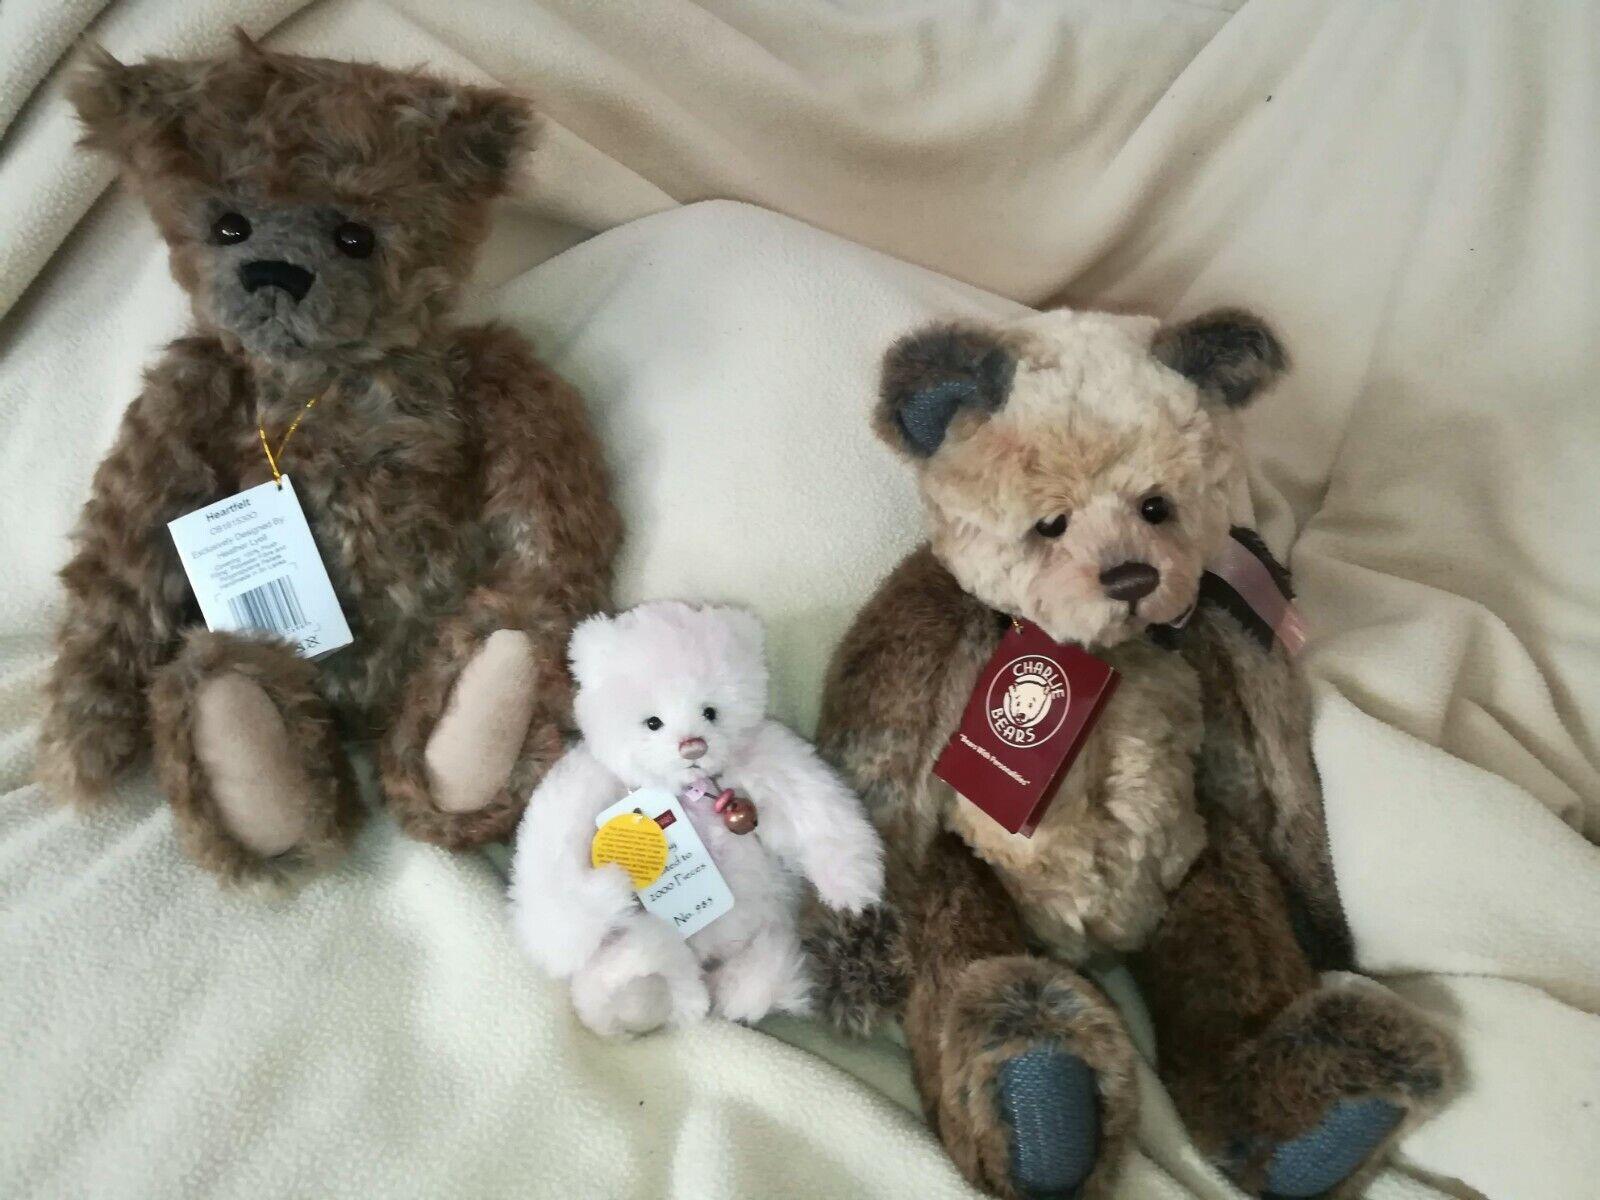 Qvc Qvc Qvc Charlie Bears Sammlerbären Agnes Heartfelt Flossy